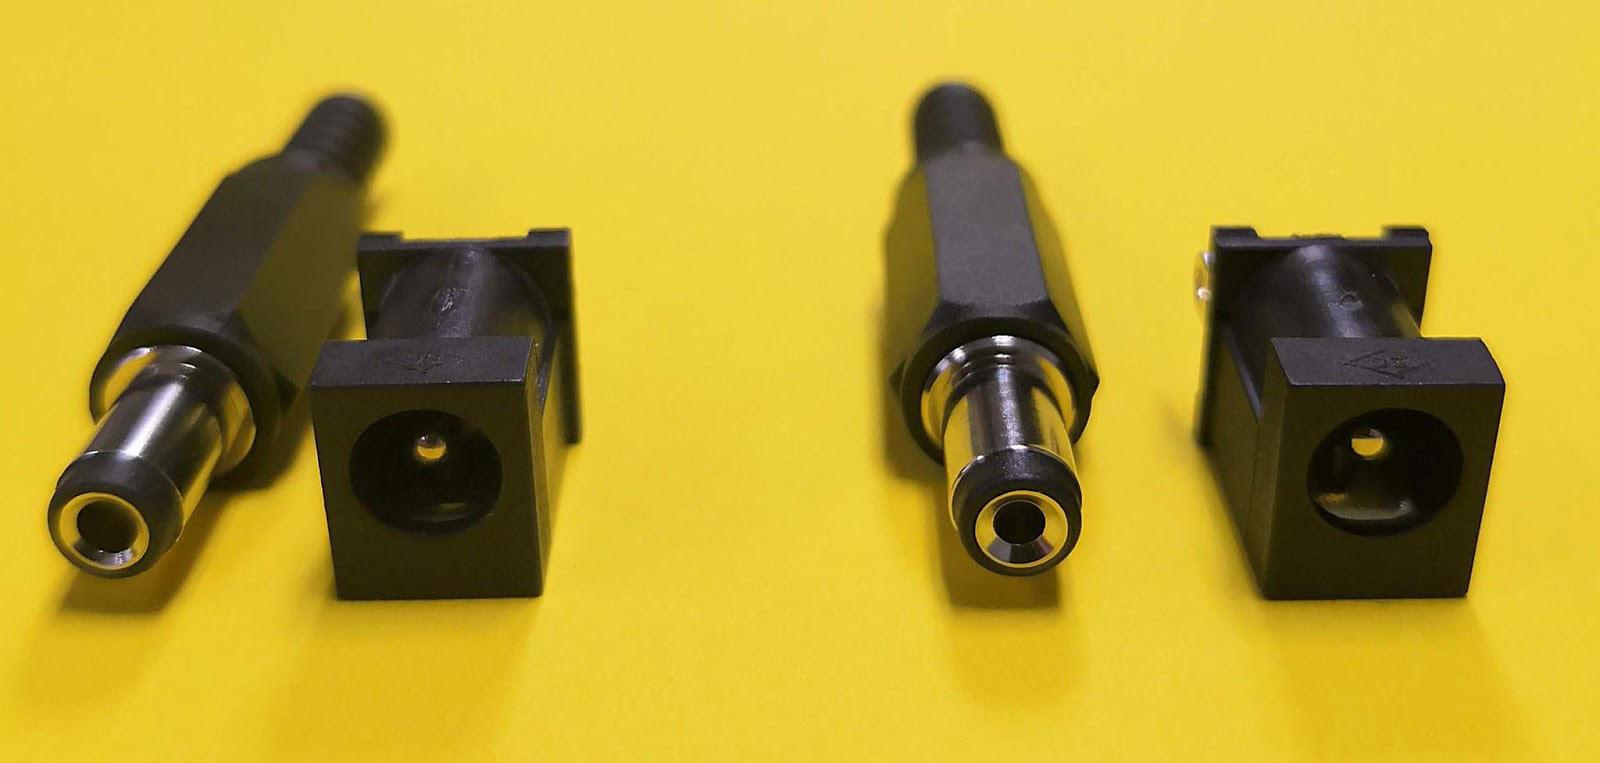 2.1mm vs 2.5mm dc power adapter tip